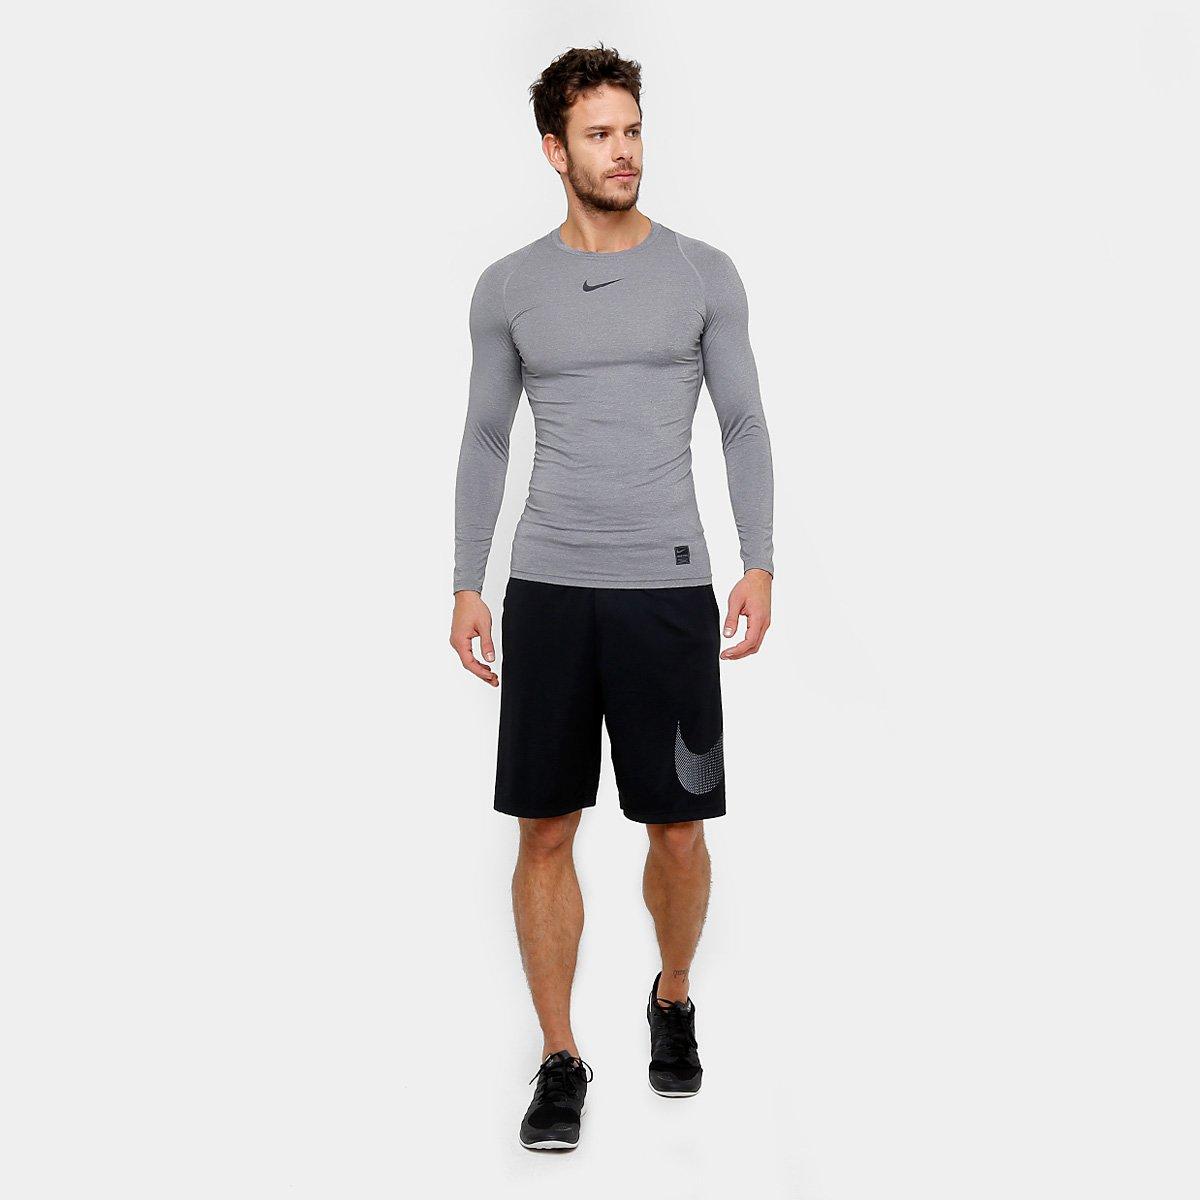 6354c4c48a63 Camiseta Compressão Nike Pro Manga Longa Masculina - Tam: GG ...